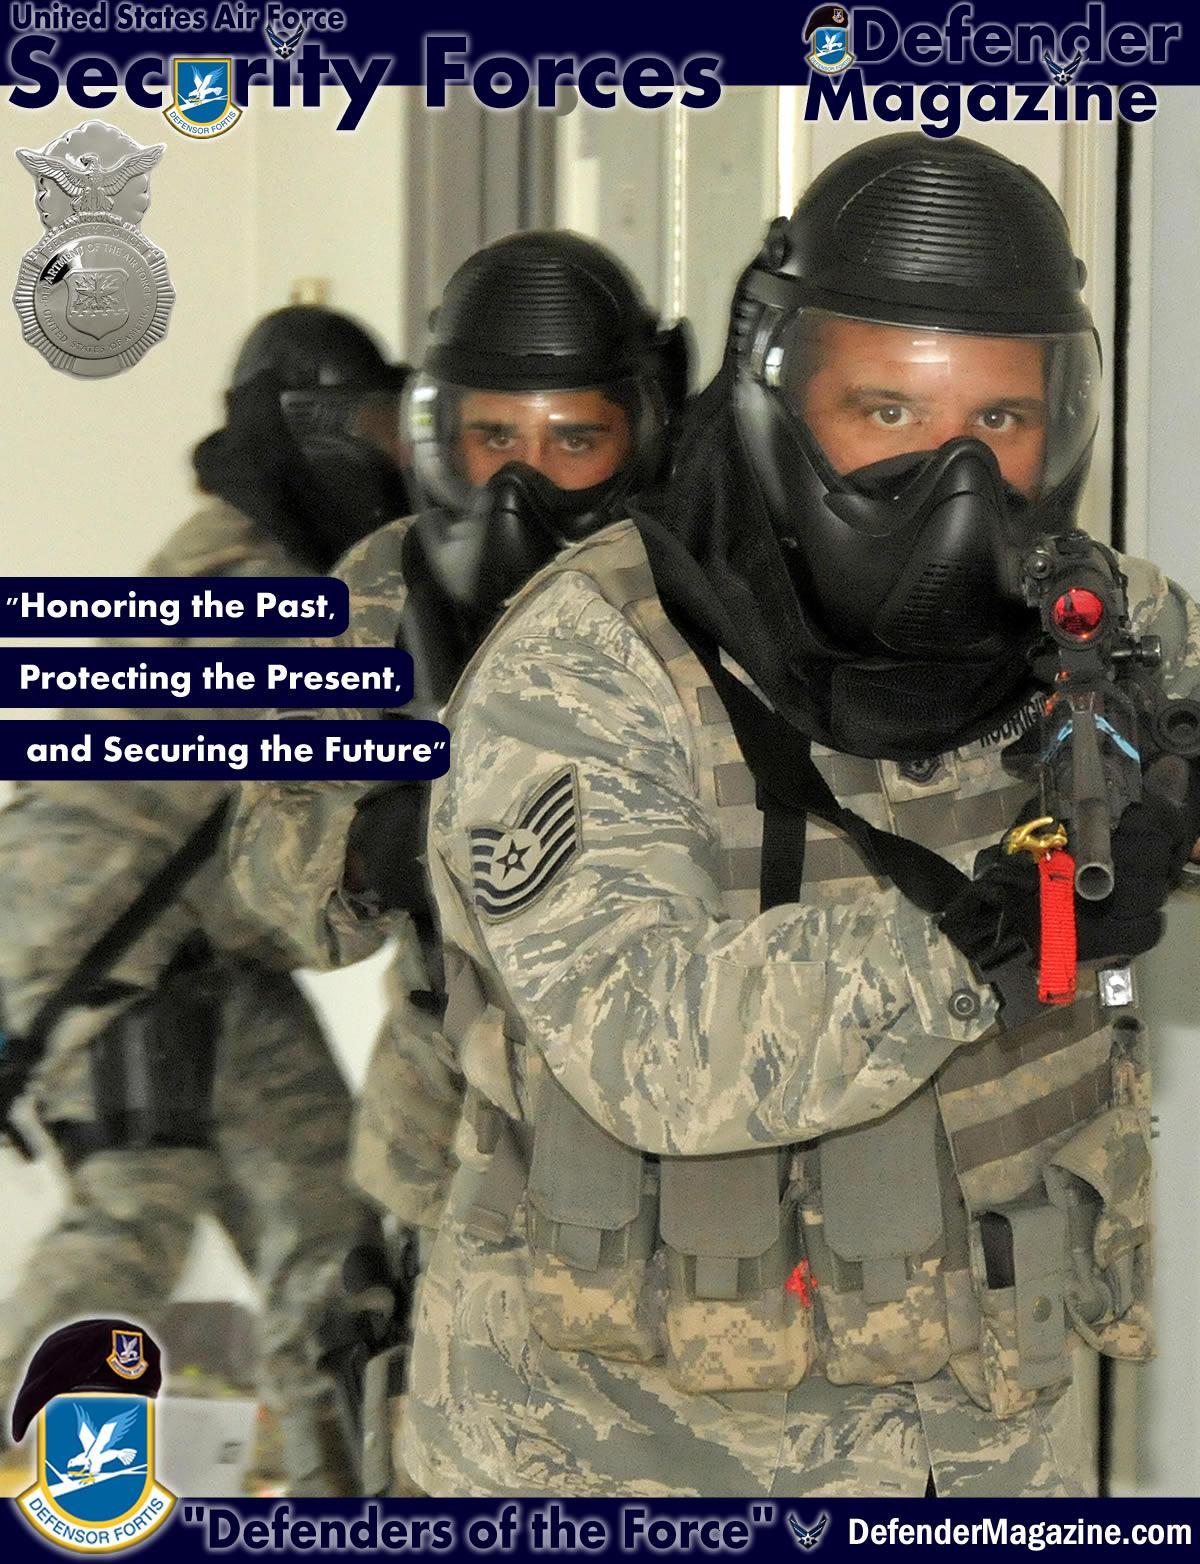 General Security Magazine